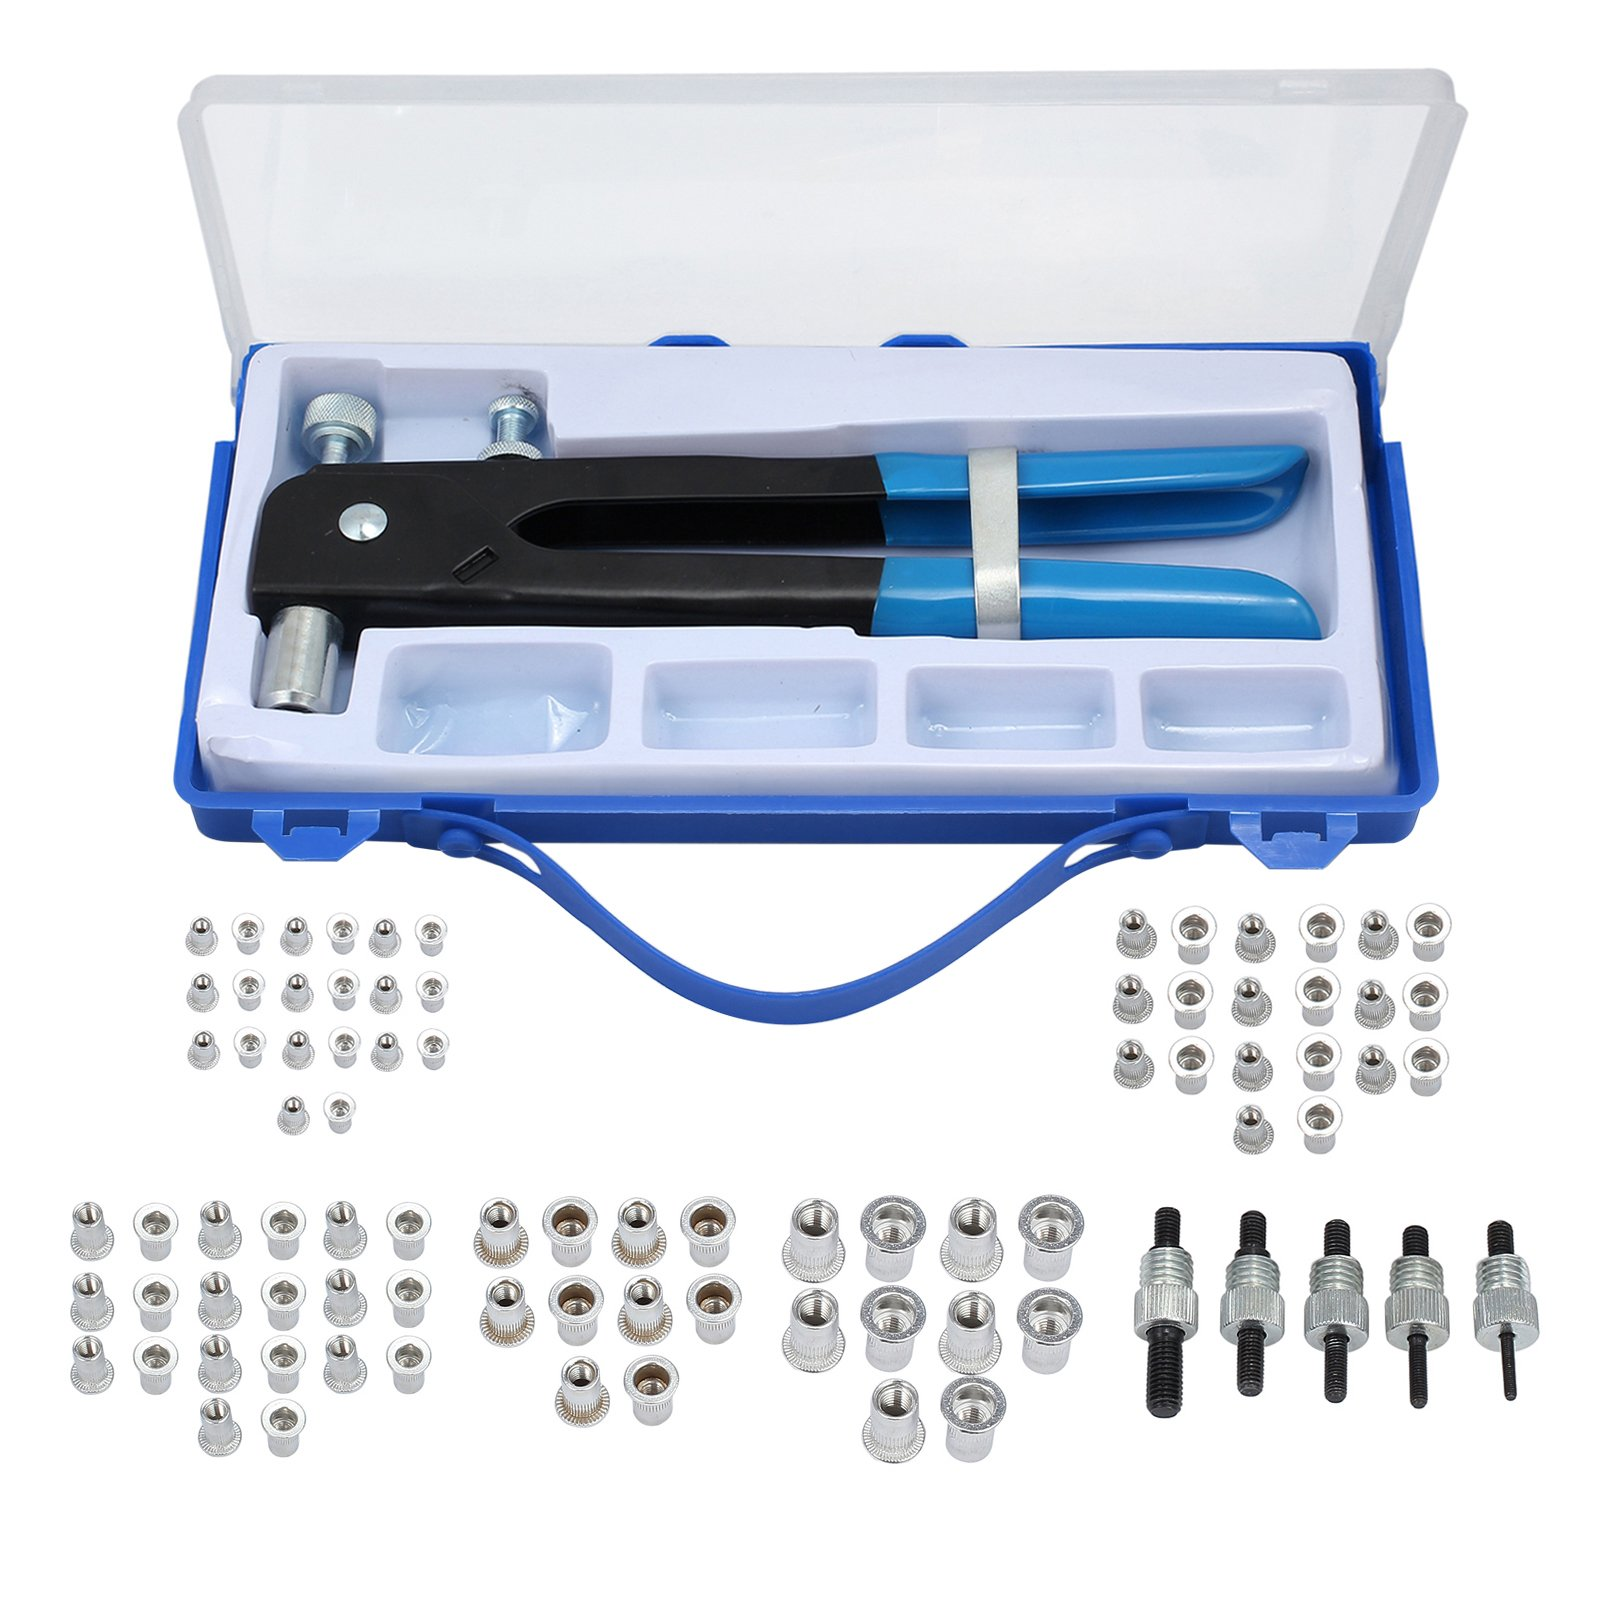 AUTOUTLET 86pcs Steel Hand Rivet Nut Tool Threaded Nut Riveter Gun&Wrench Rivnut Nutsert Kit M3/M4/M5/M6/M8 Aluminum Nuts